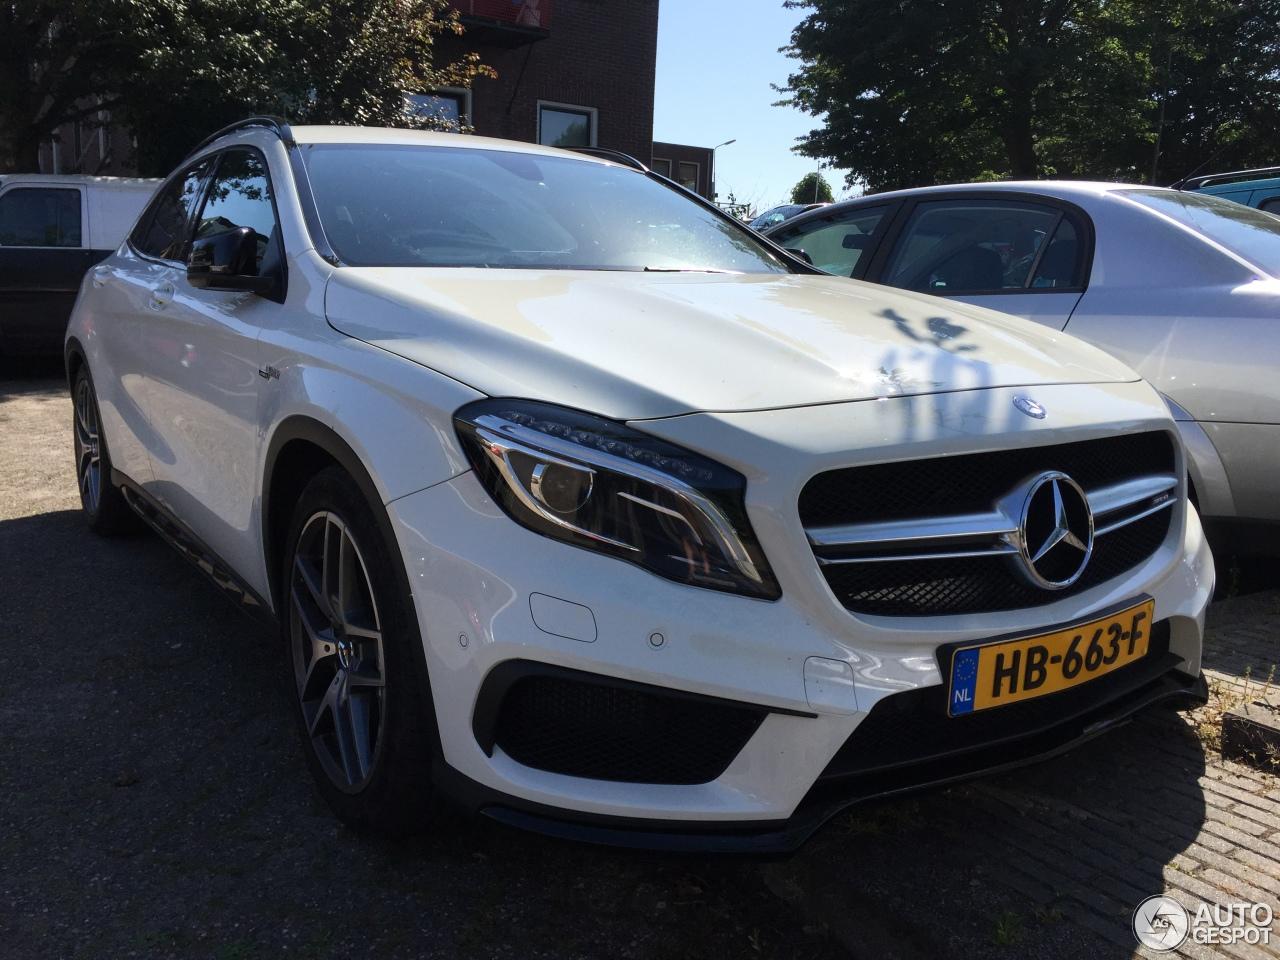 Mercedes benz gla 45 amg x156 6 june 2016 autogespot for Mercedes benz gla 45 amg price